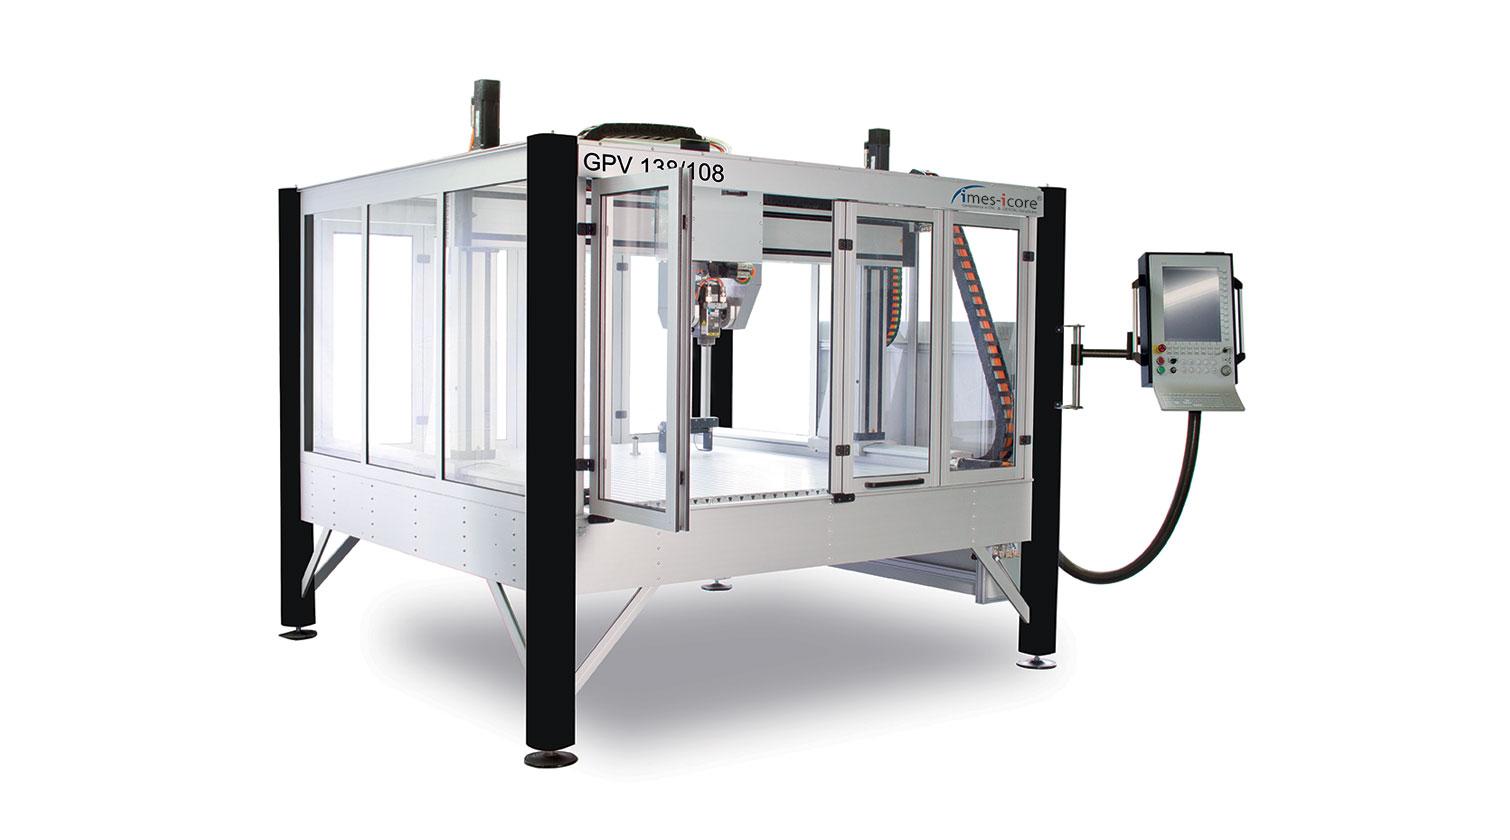 INT CNC Imes Icore GPV GPY